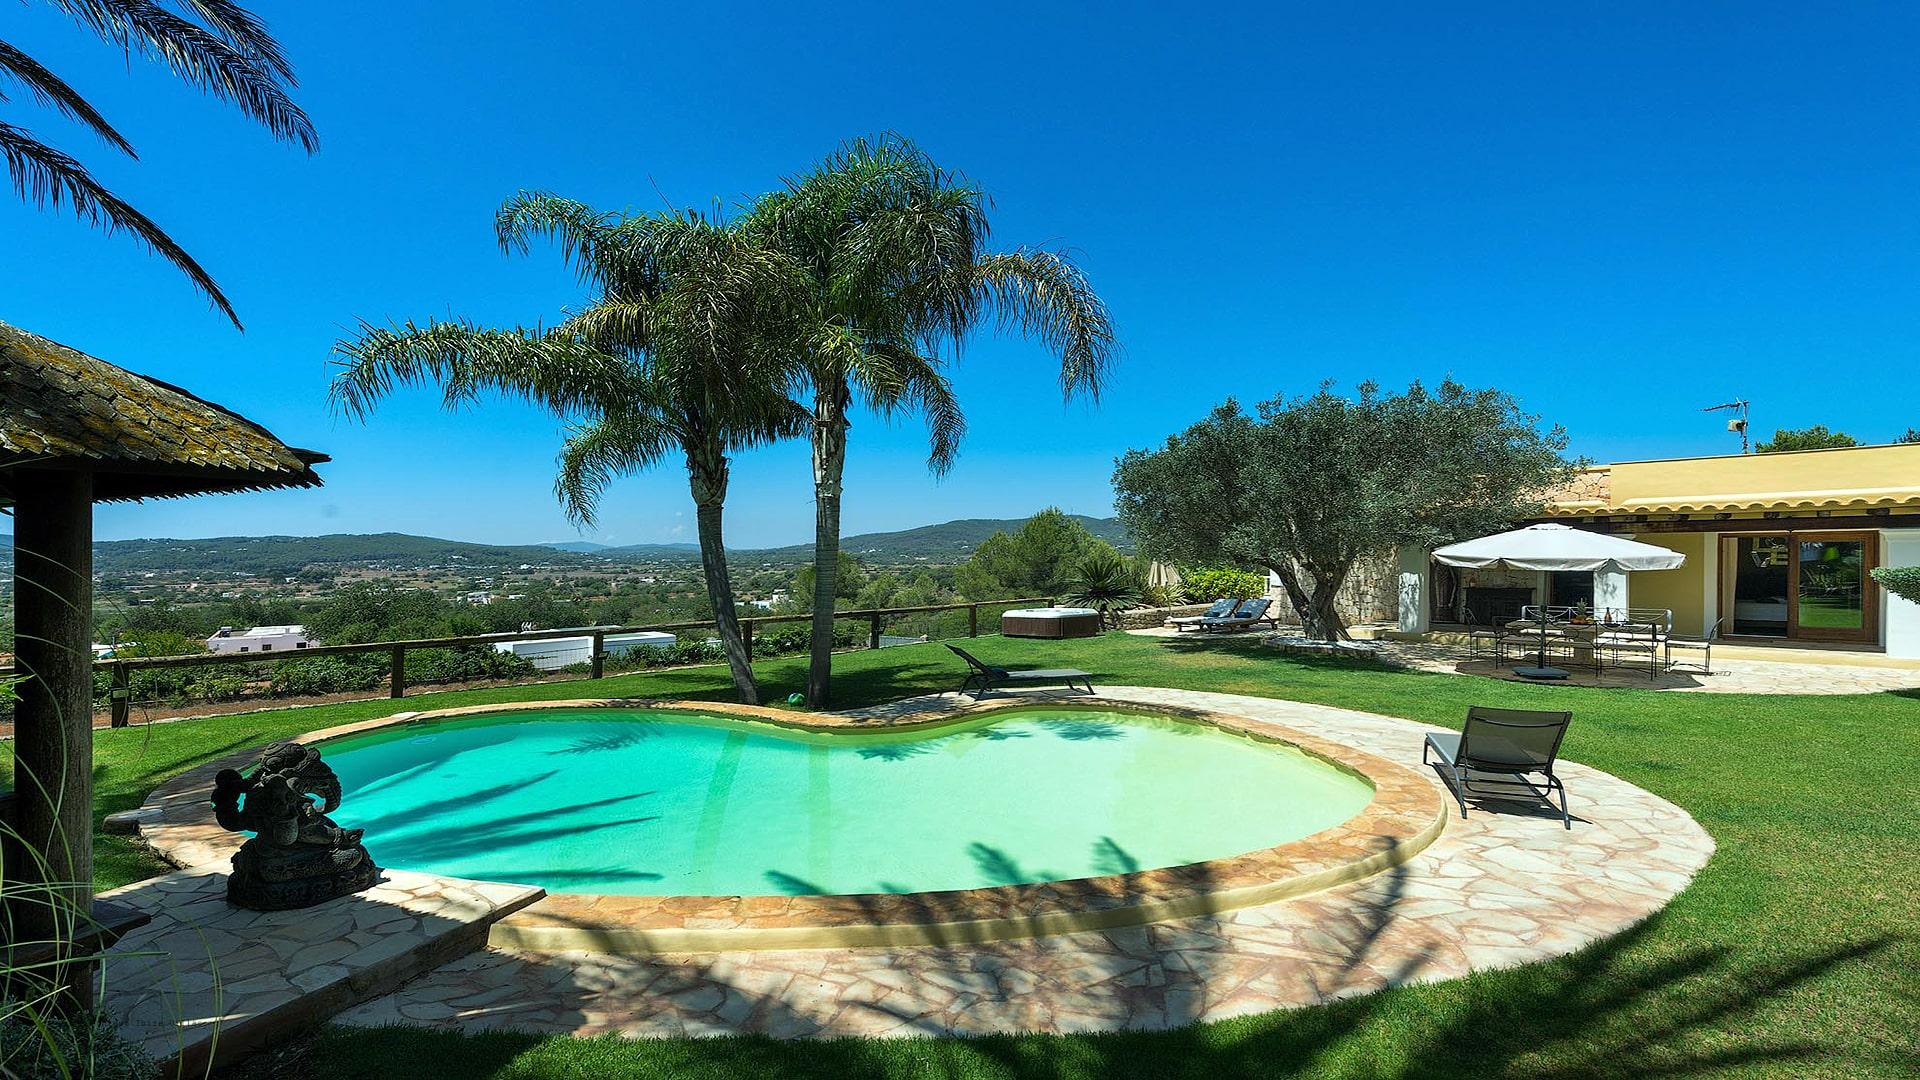 Casa Beni Ibiza 1 Santa Eulalia